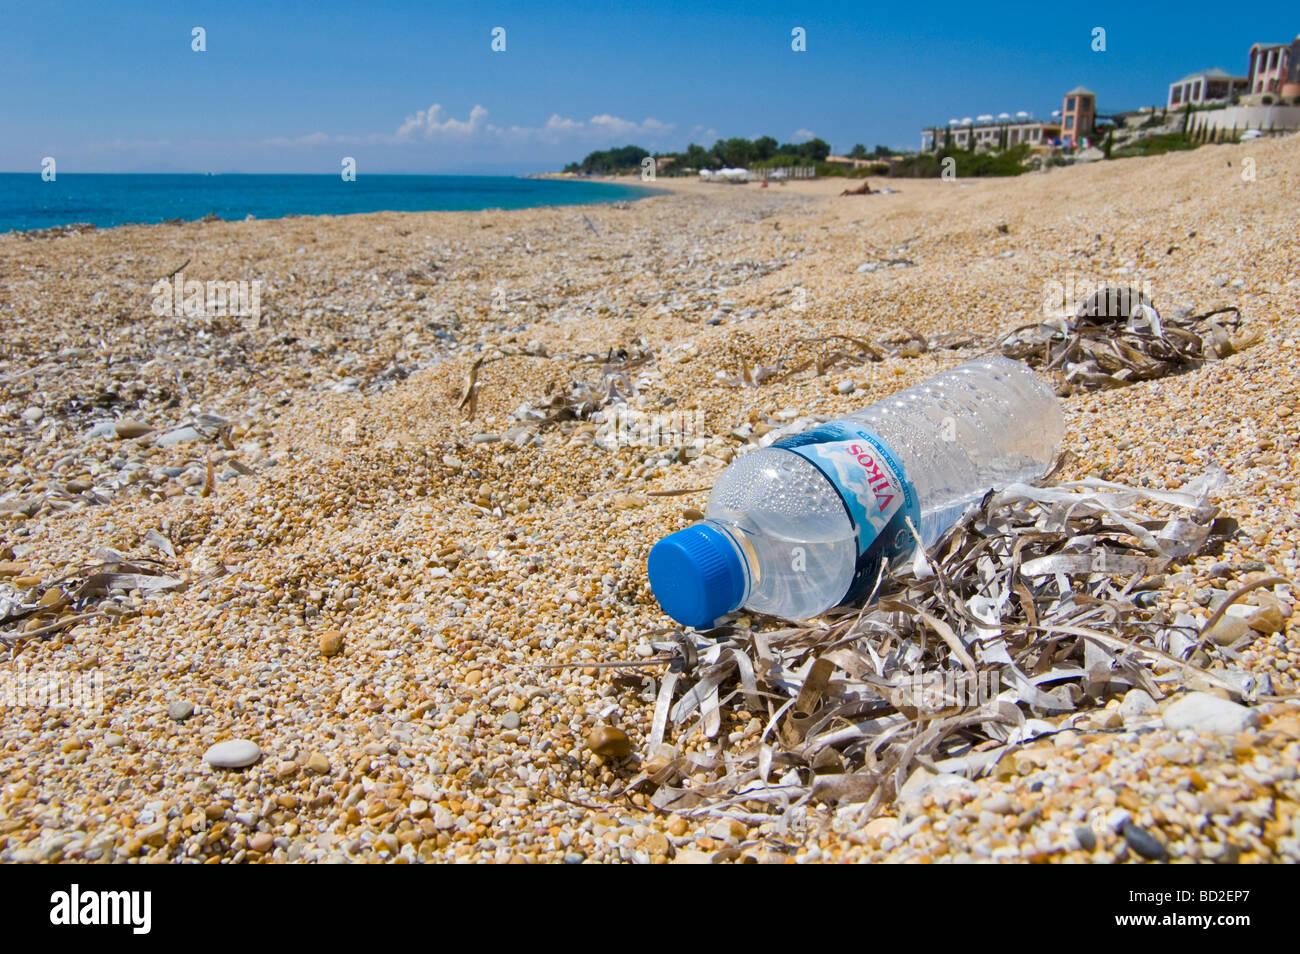 Plastic water bottle dropped as litter on beach at Skala on the Greek island of Kefalonia Greece GR - Stock Image